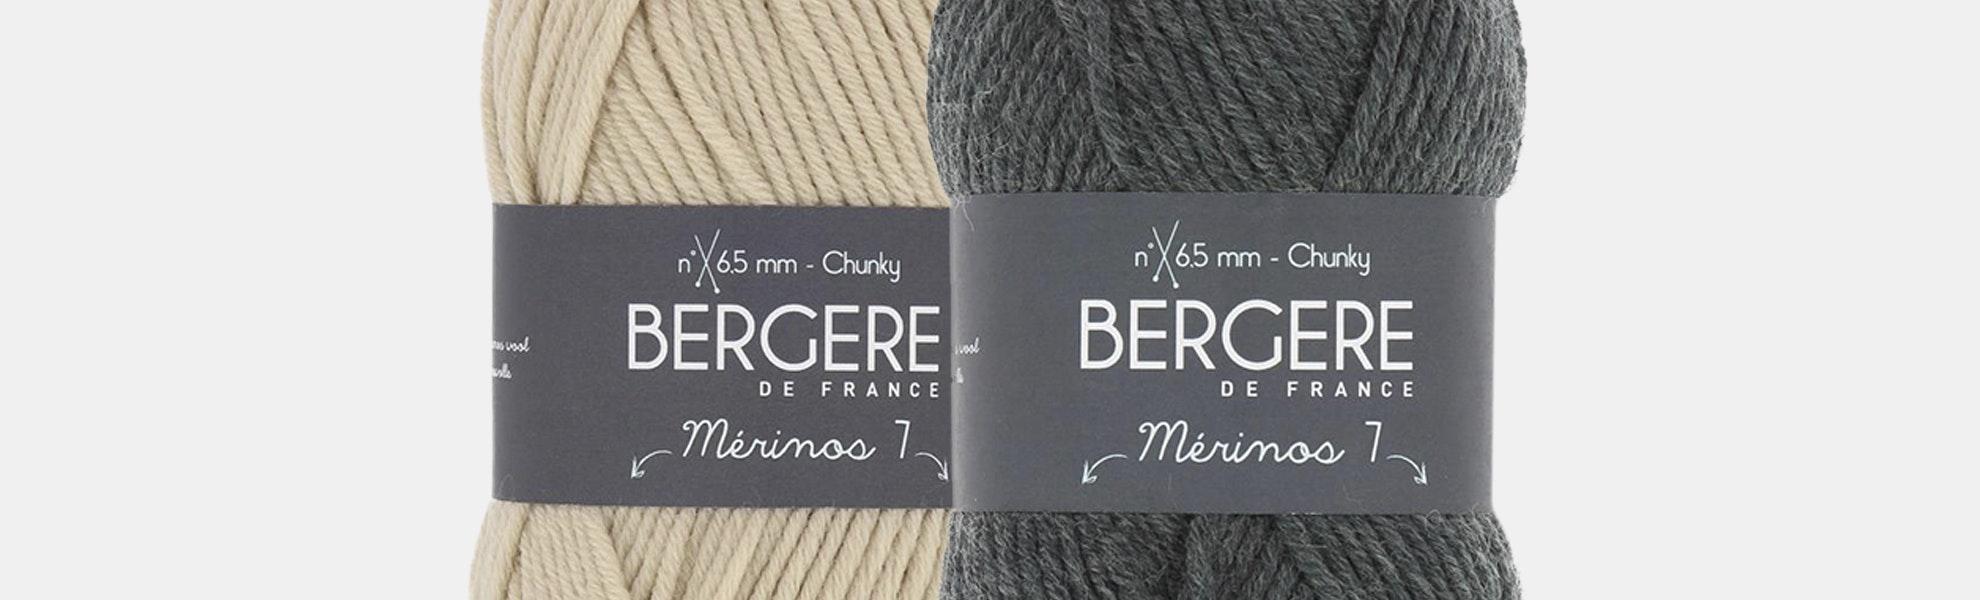 Merinos 7 Yarn by Bergere De France (2-Pack)